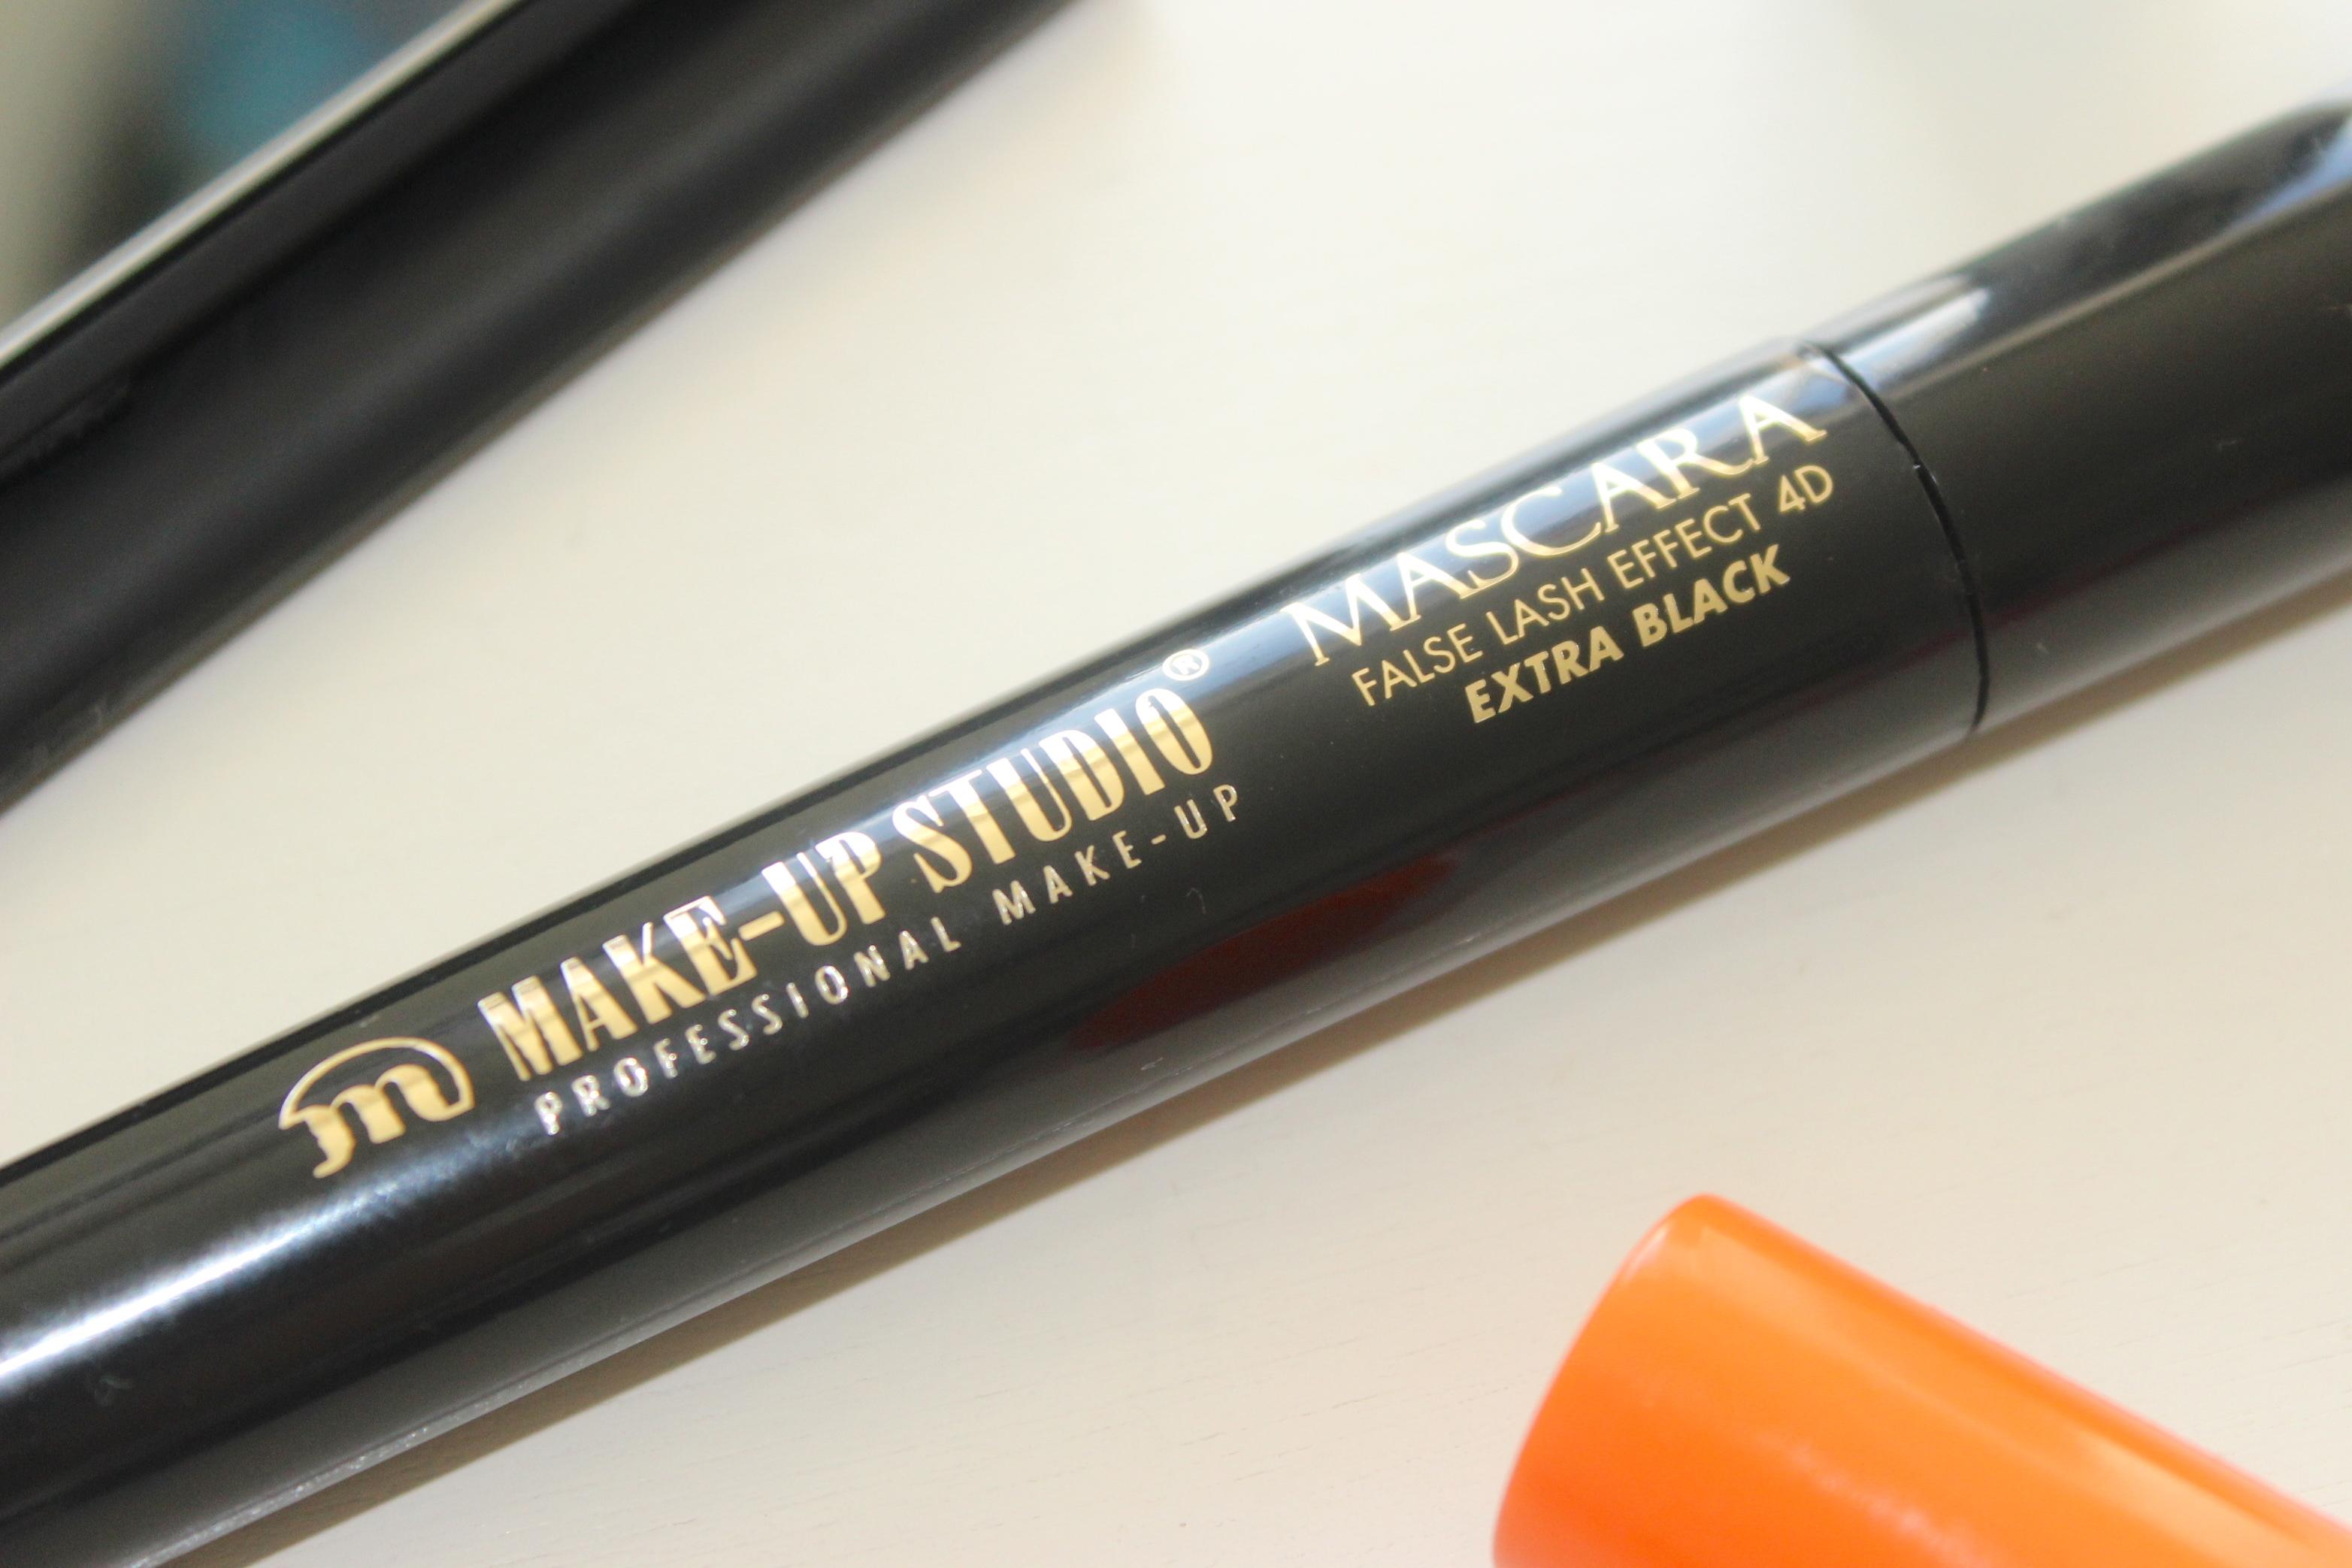 Make-up studio false lash effect 4d exra black mascara